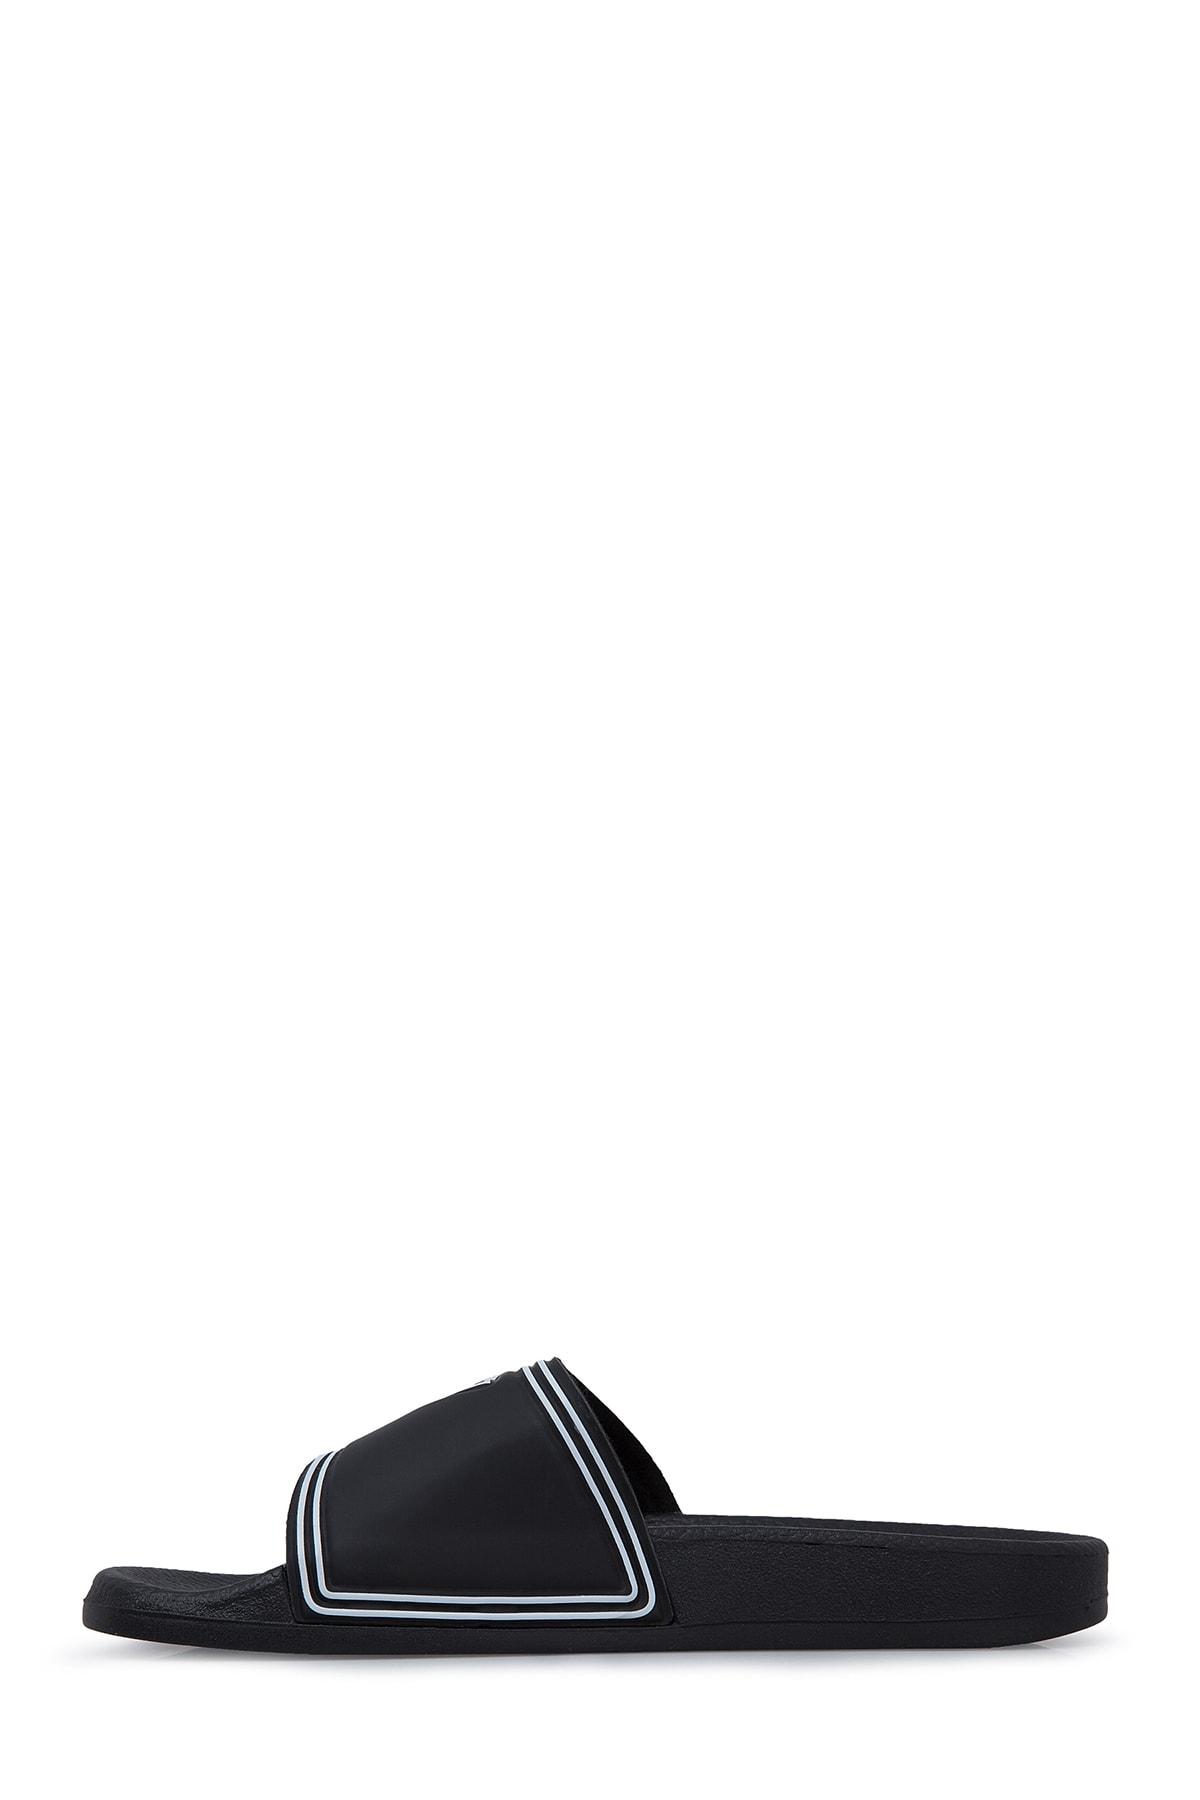 Emporio Armani Siyah Kadın Terlik S X3P706 XD184 00500 2